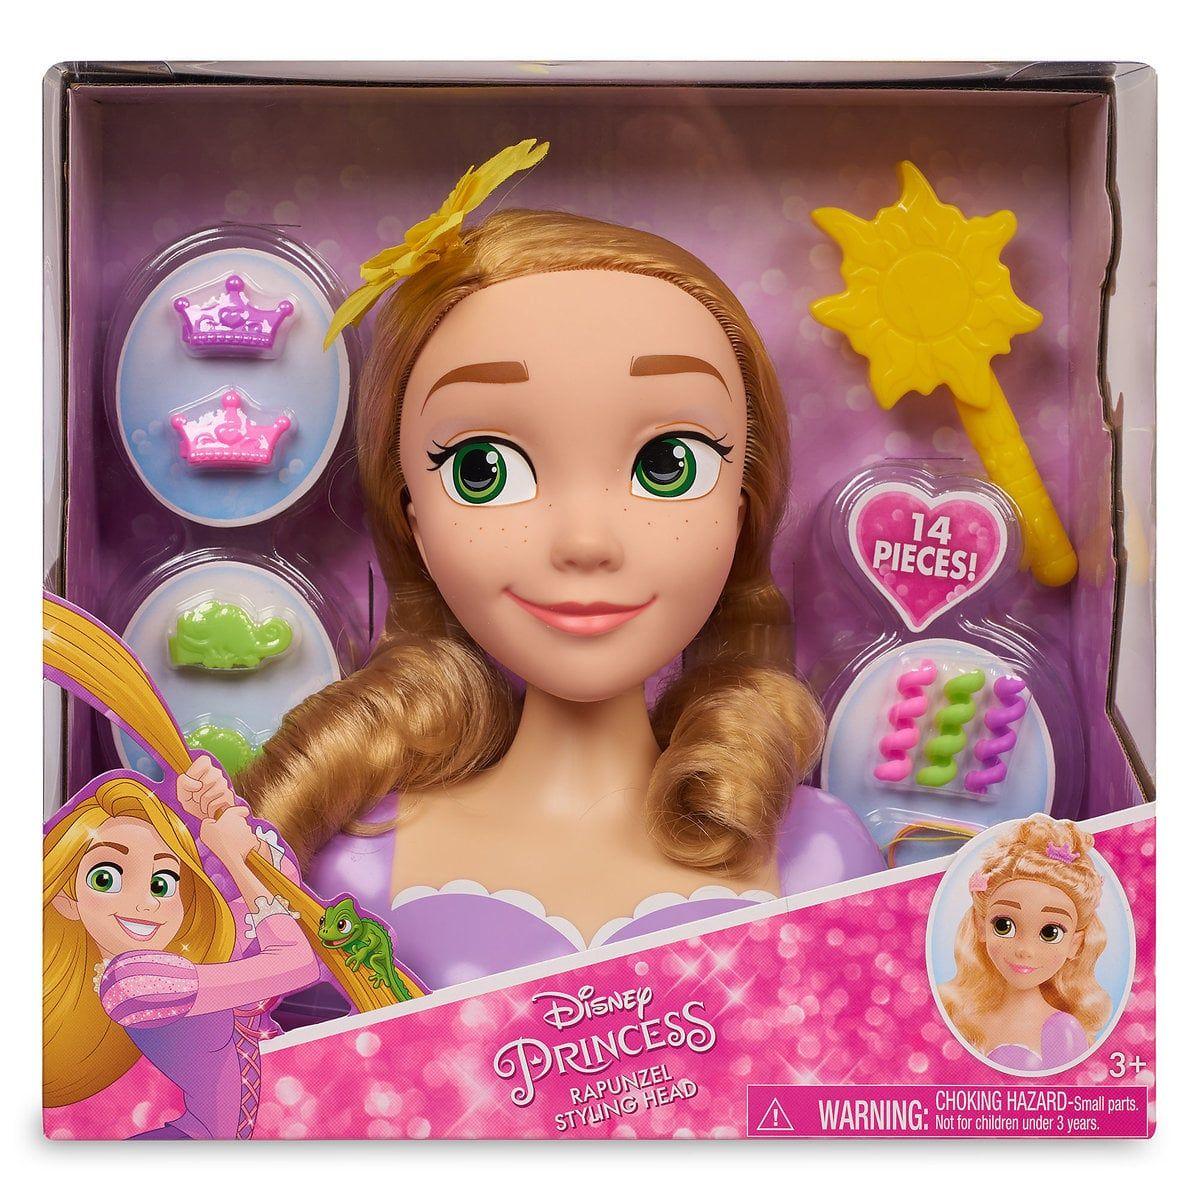 Rapunzel Deluxe Styling Head Shopdisney Rapunzel Princess Toys Barbie Doll Set